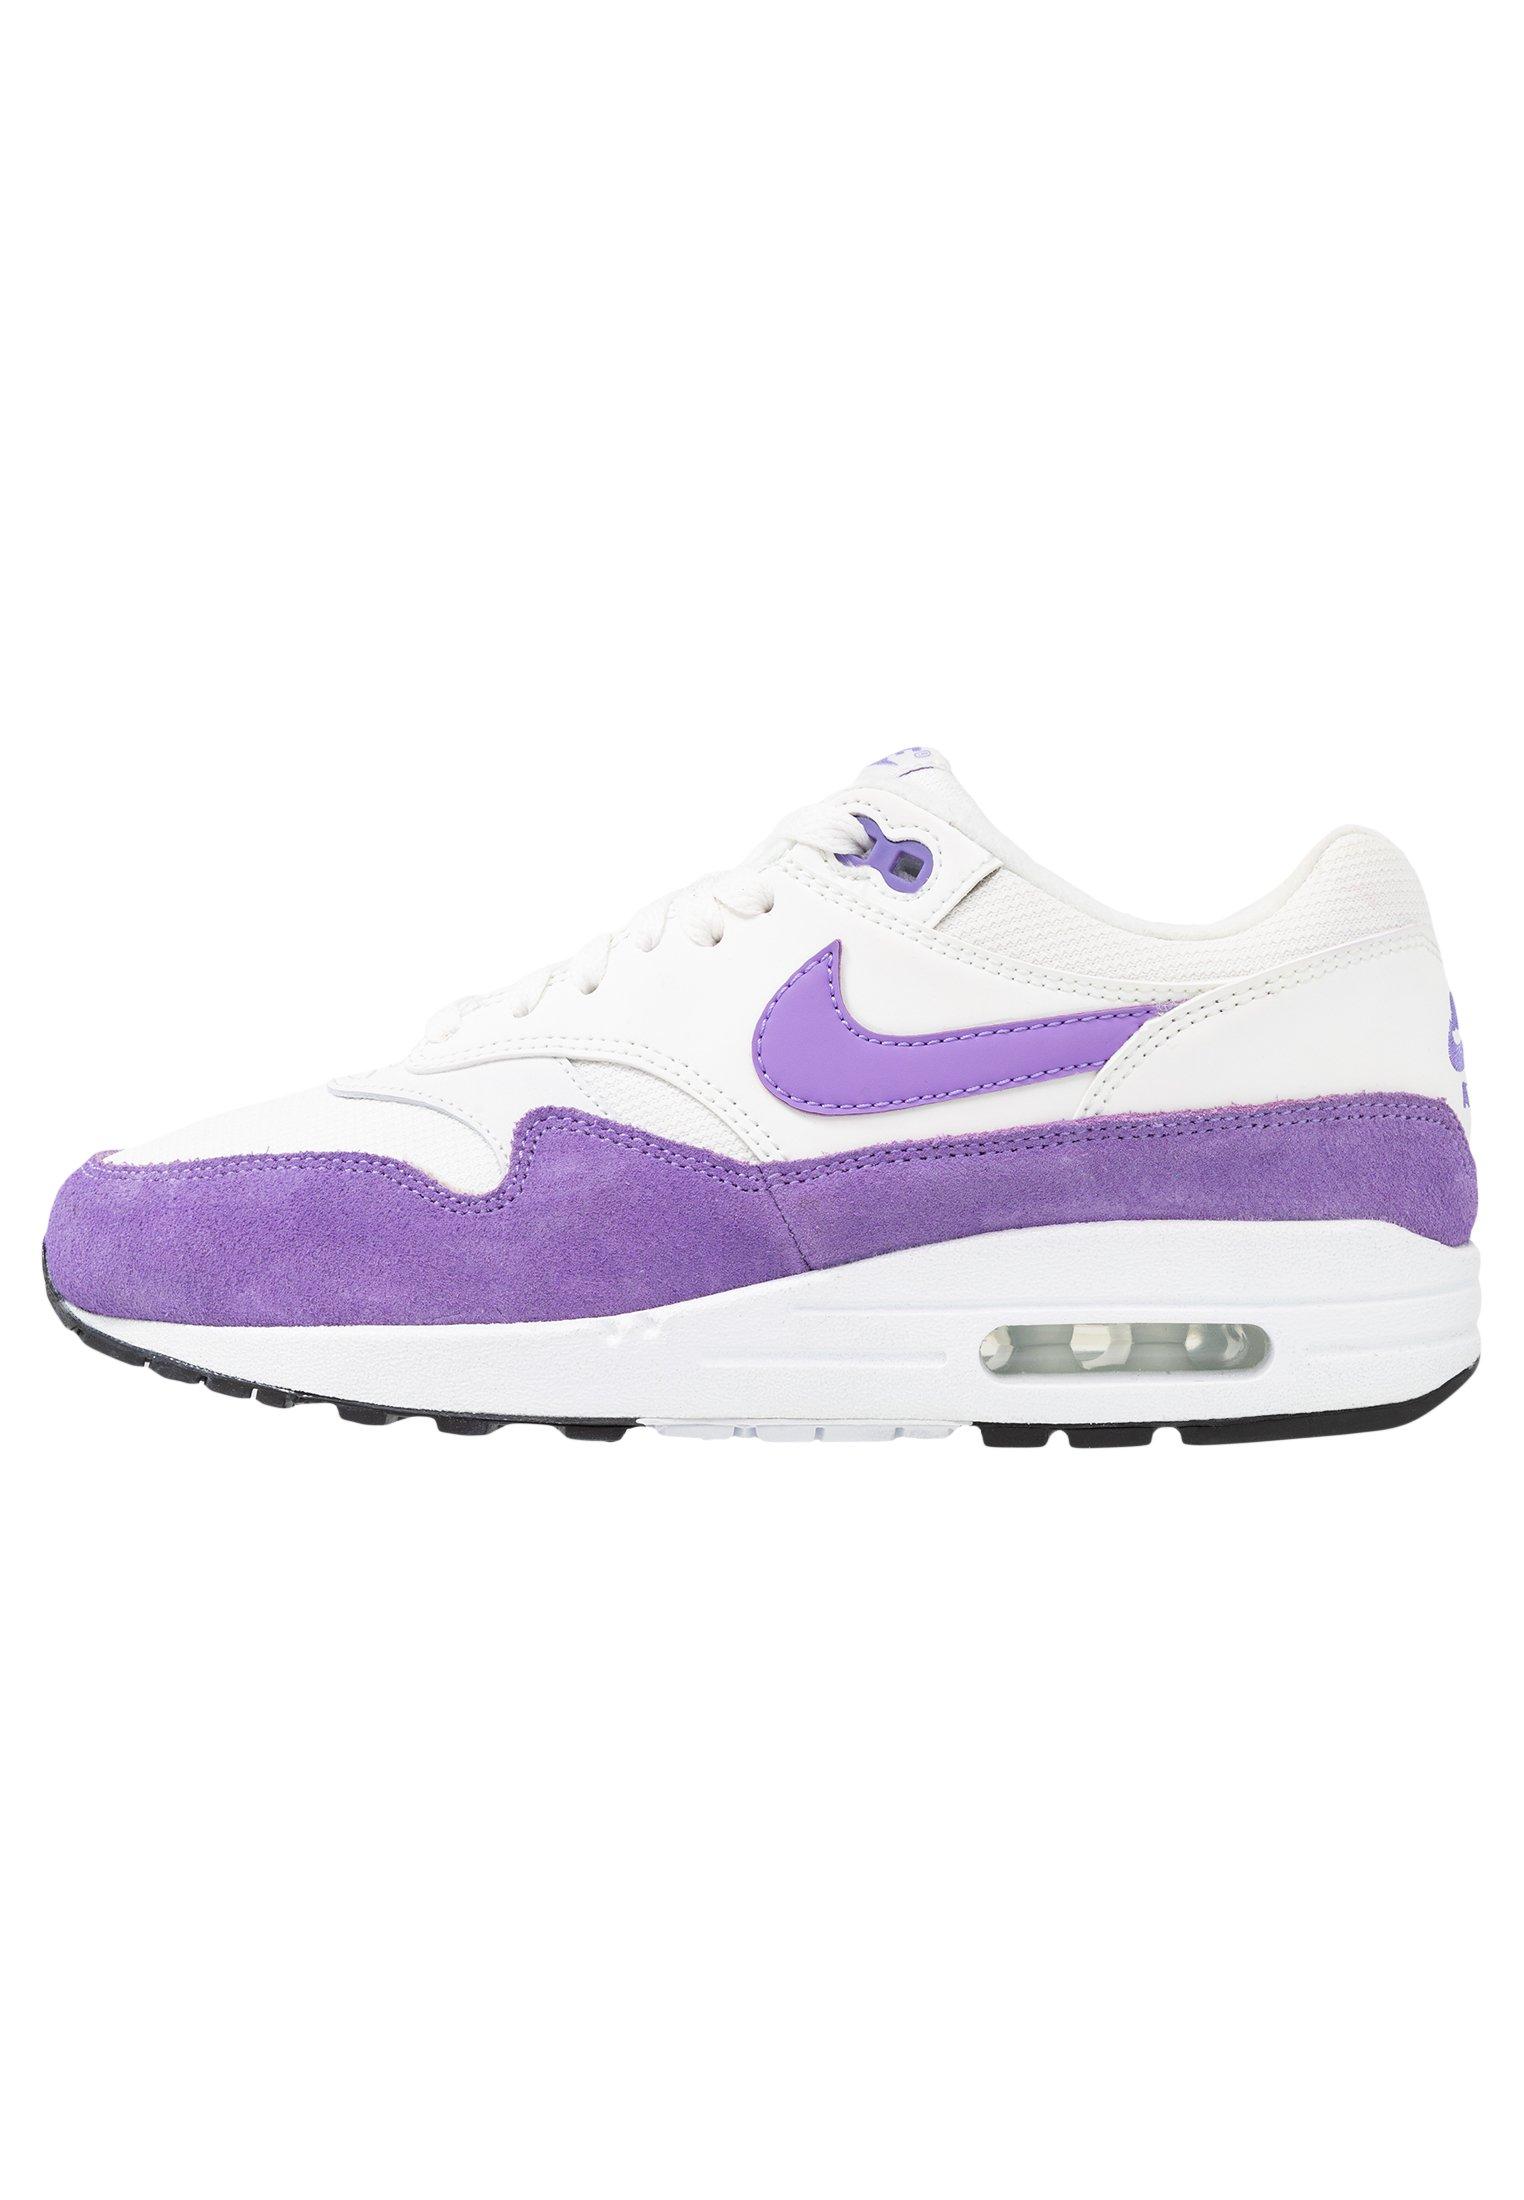 air max 1 violet